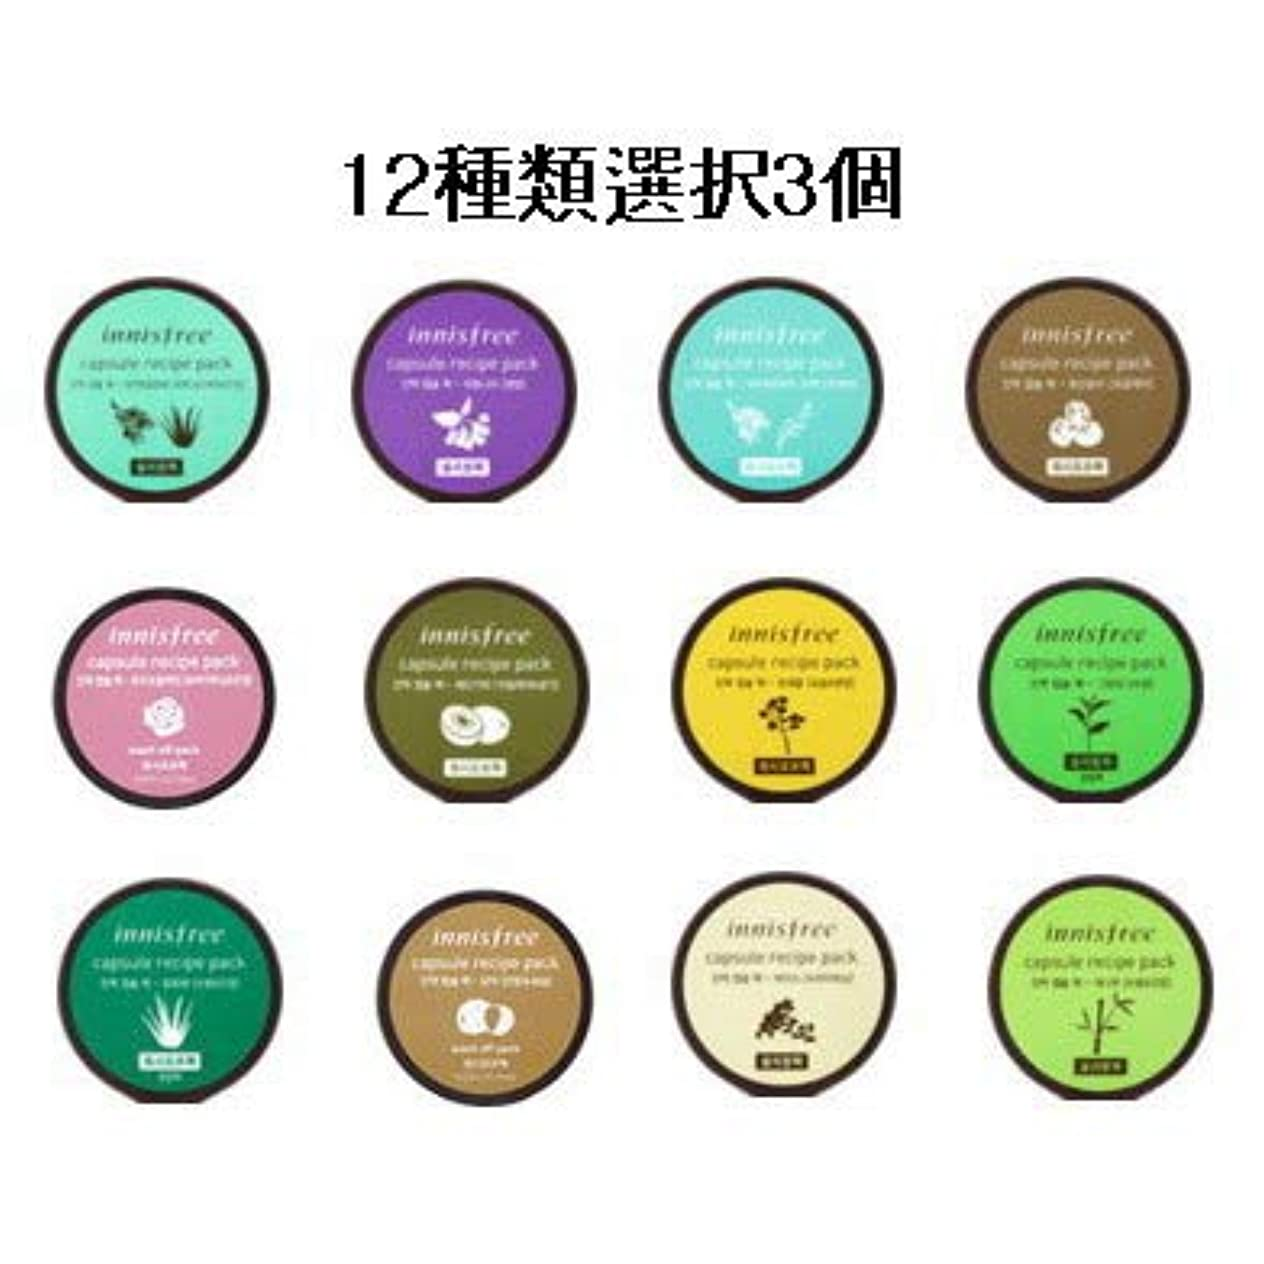 【innisfree(イニスフリー)】津液カプセルパック10ml×3個 (12種類選択3個) [並行輸入品]